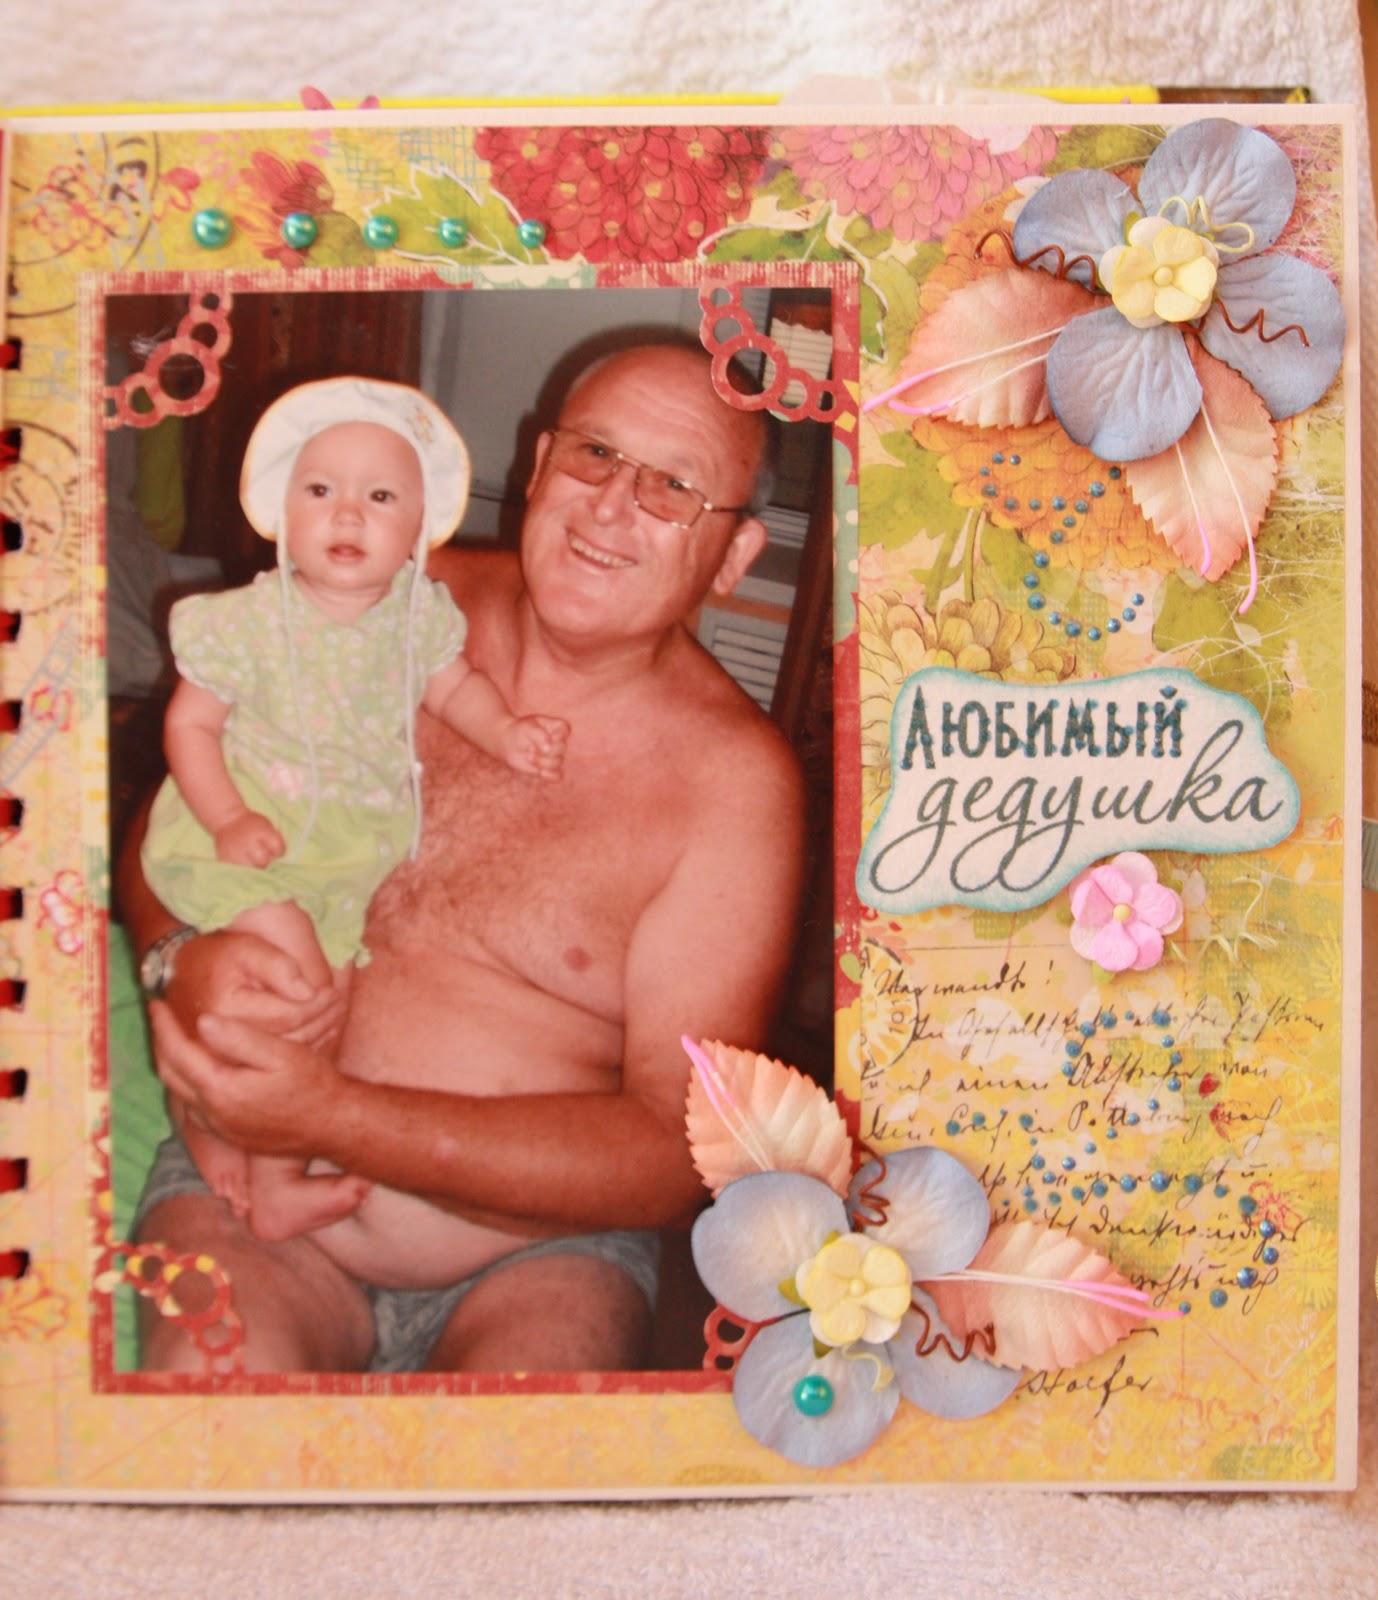 Как сделать подарок бабушке или дедушке